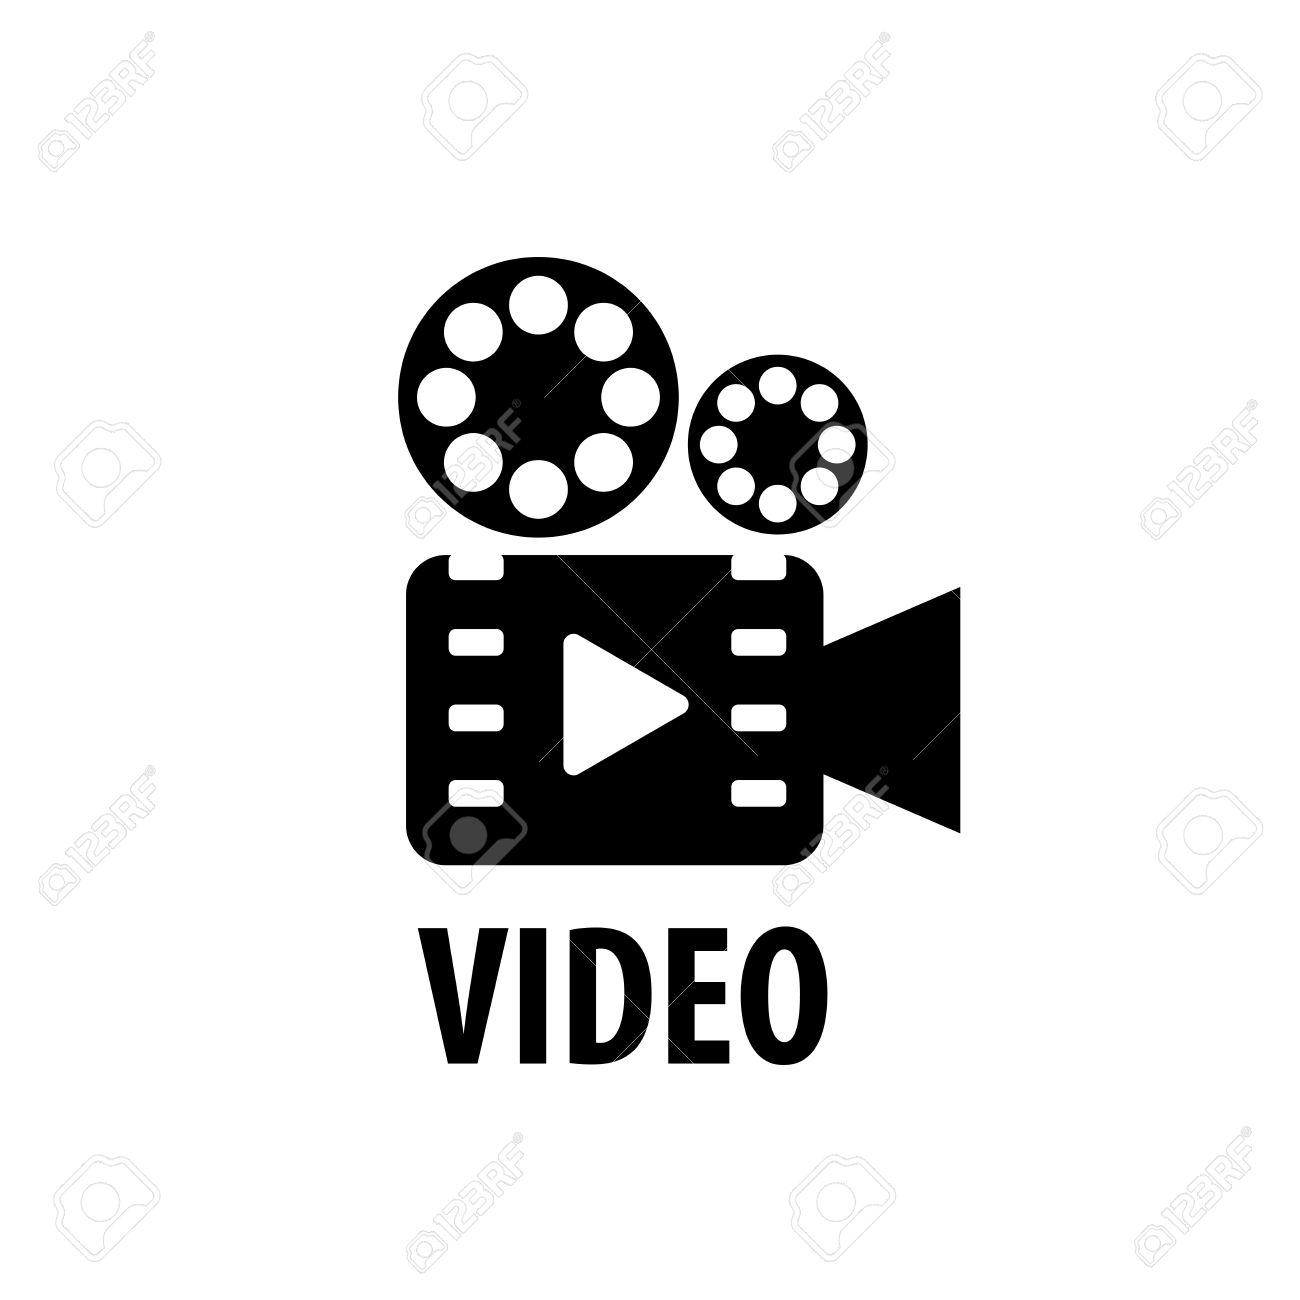 Video Camera Logo Design Template. Vector Illustration Royalty.